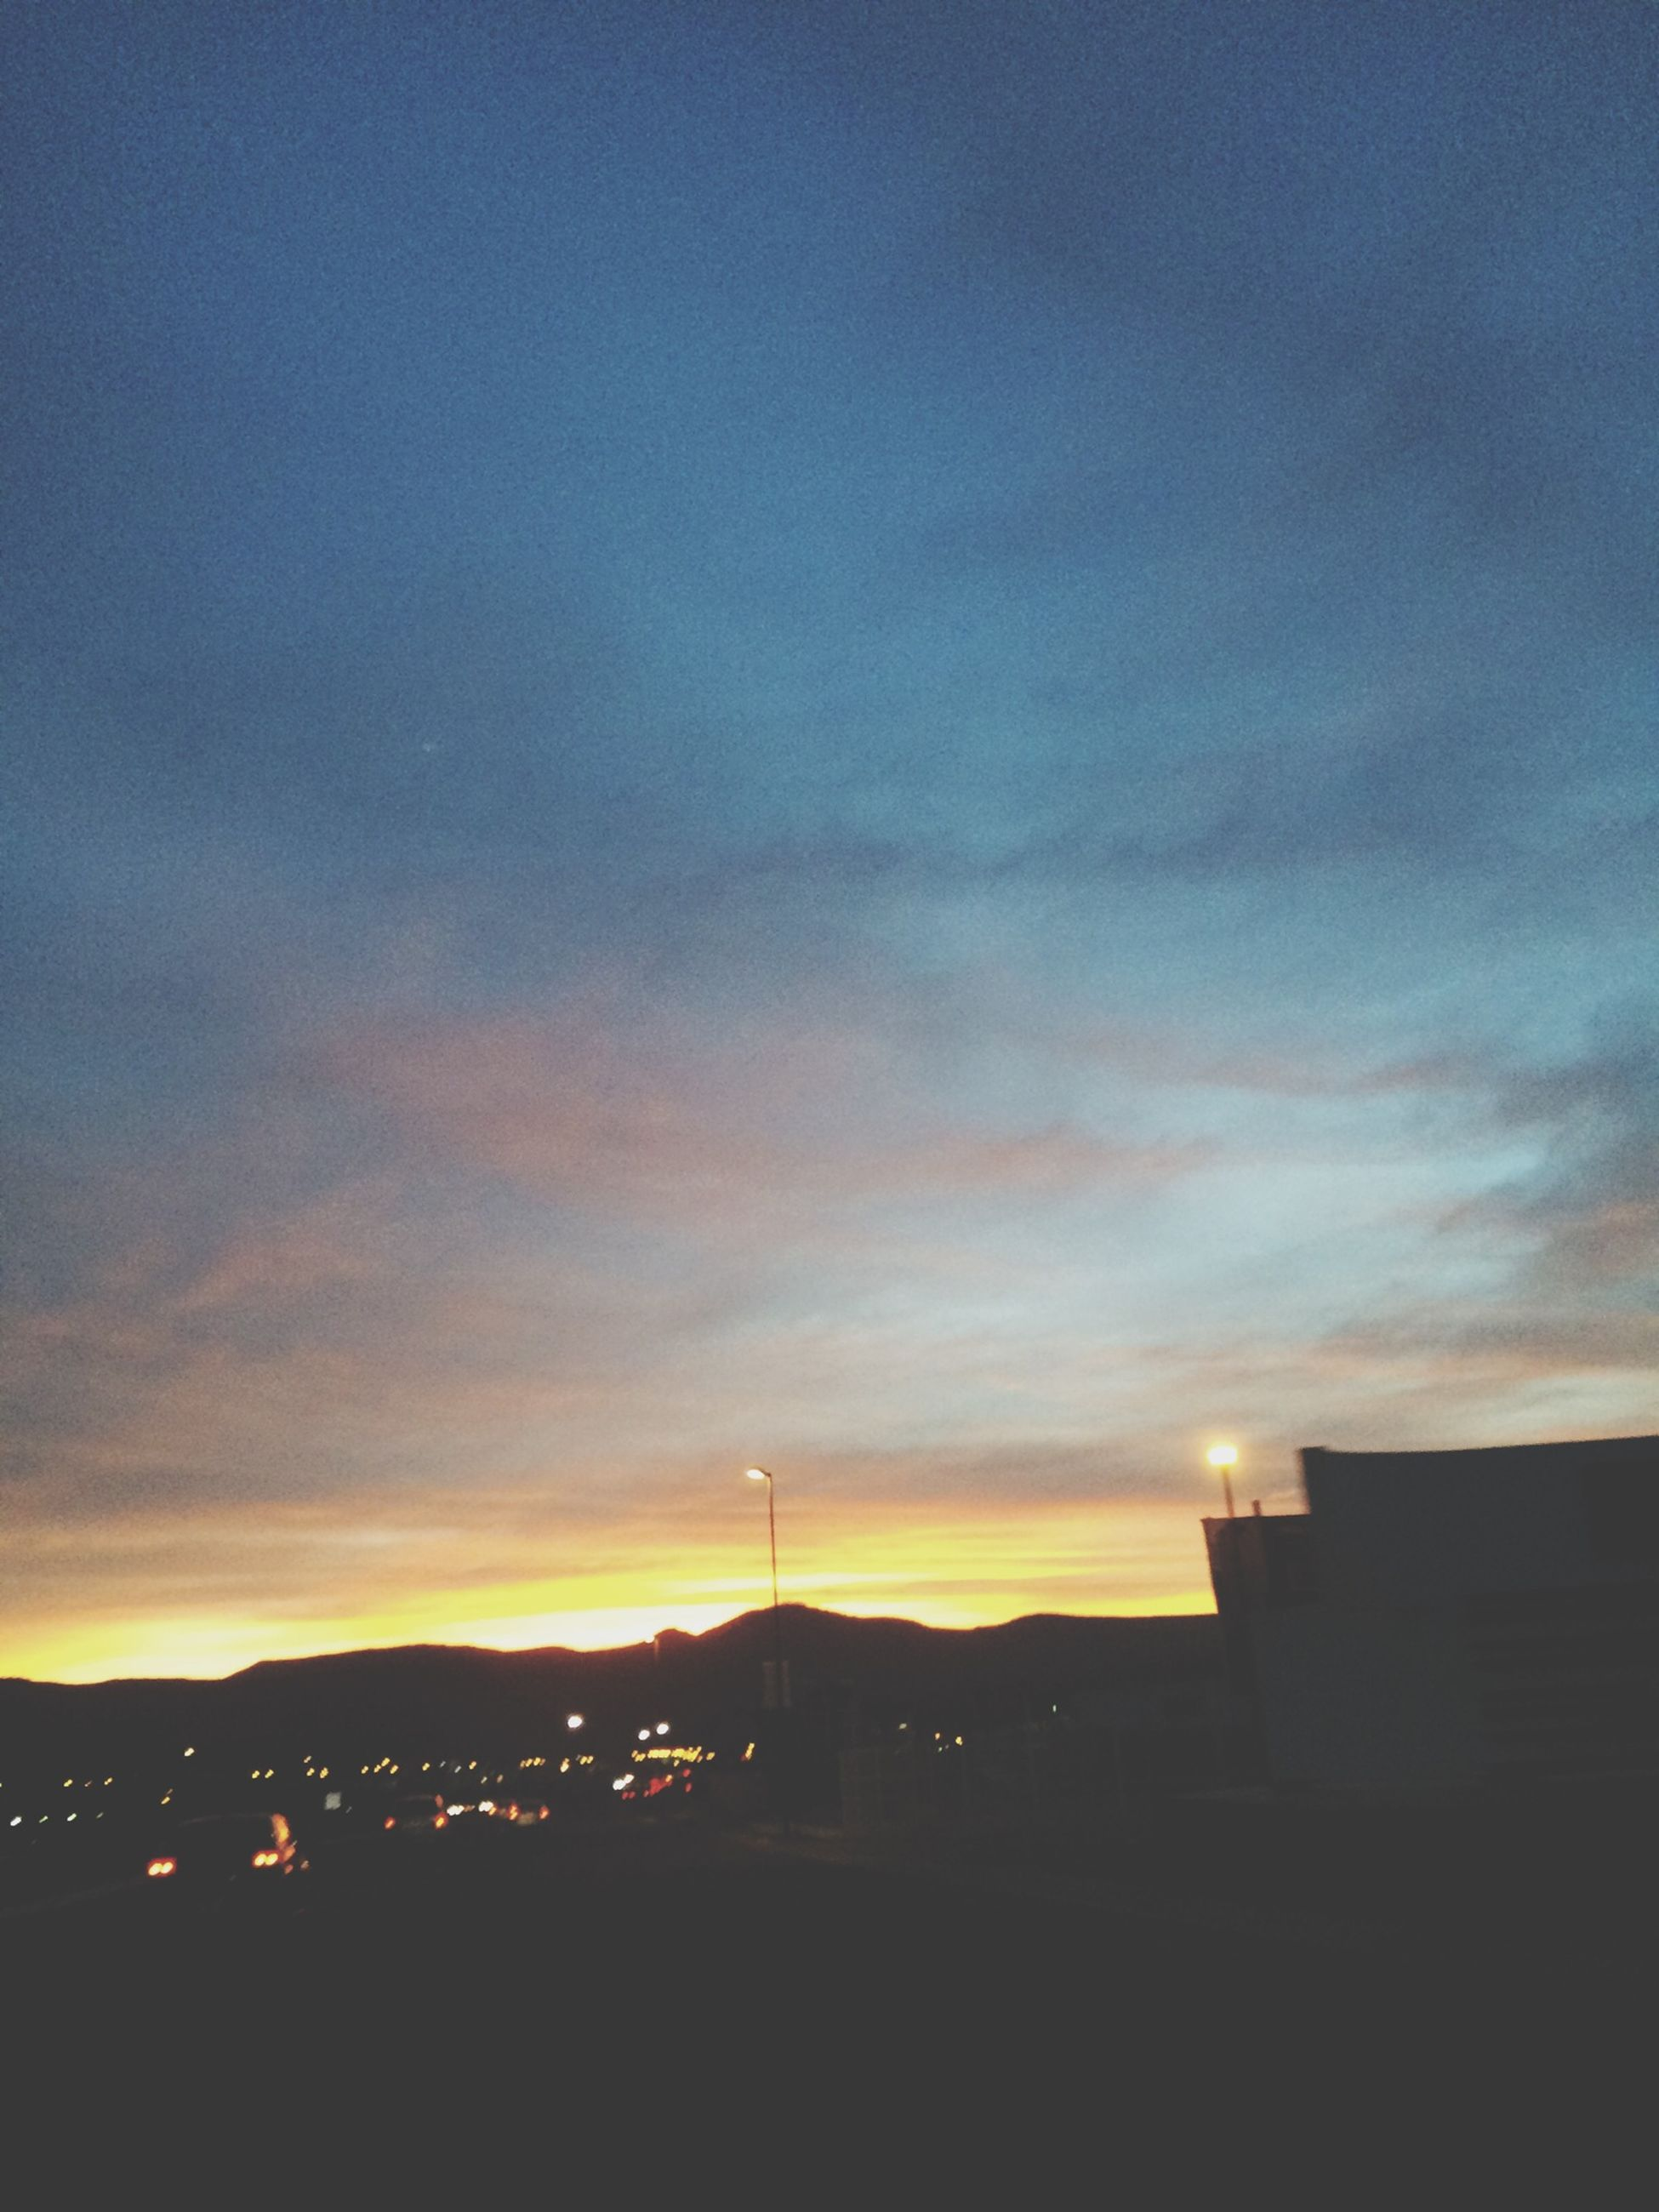 building exterior, architecture, built structure, sunset, silhouette, sky, city, cloud - sky, illuminated, dusk, residential structure, residential building, dark, building, orange color, cloud, house, outdoors, cityscape, no people